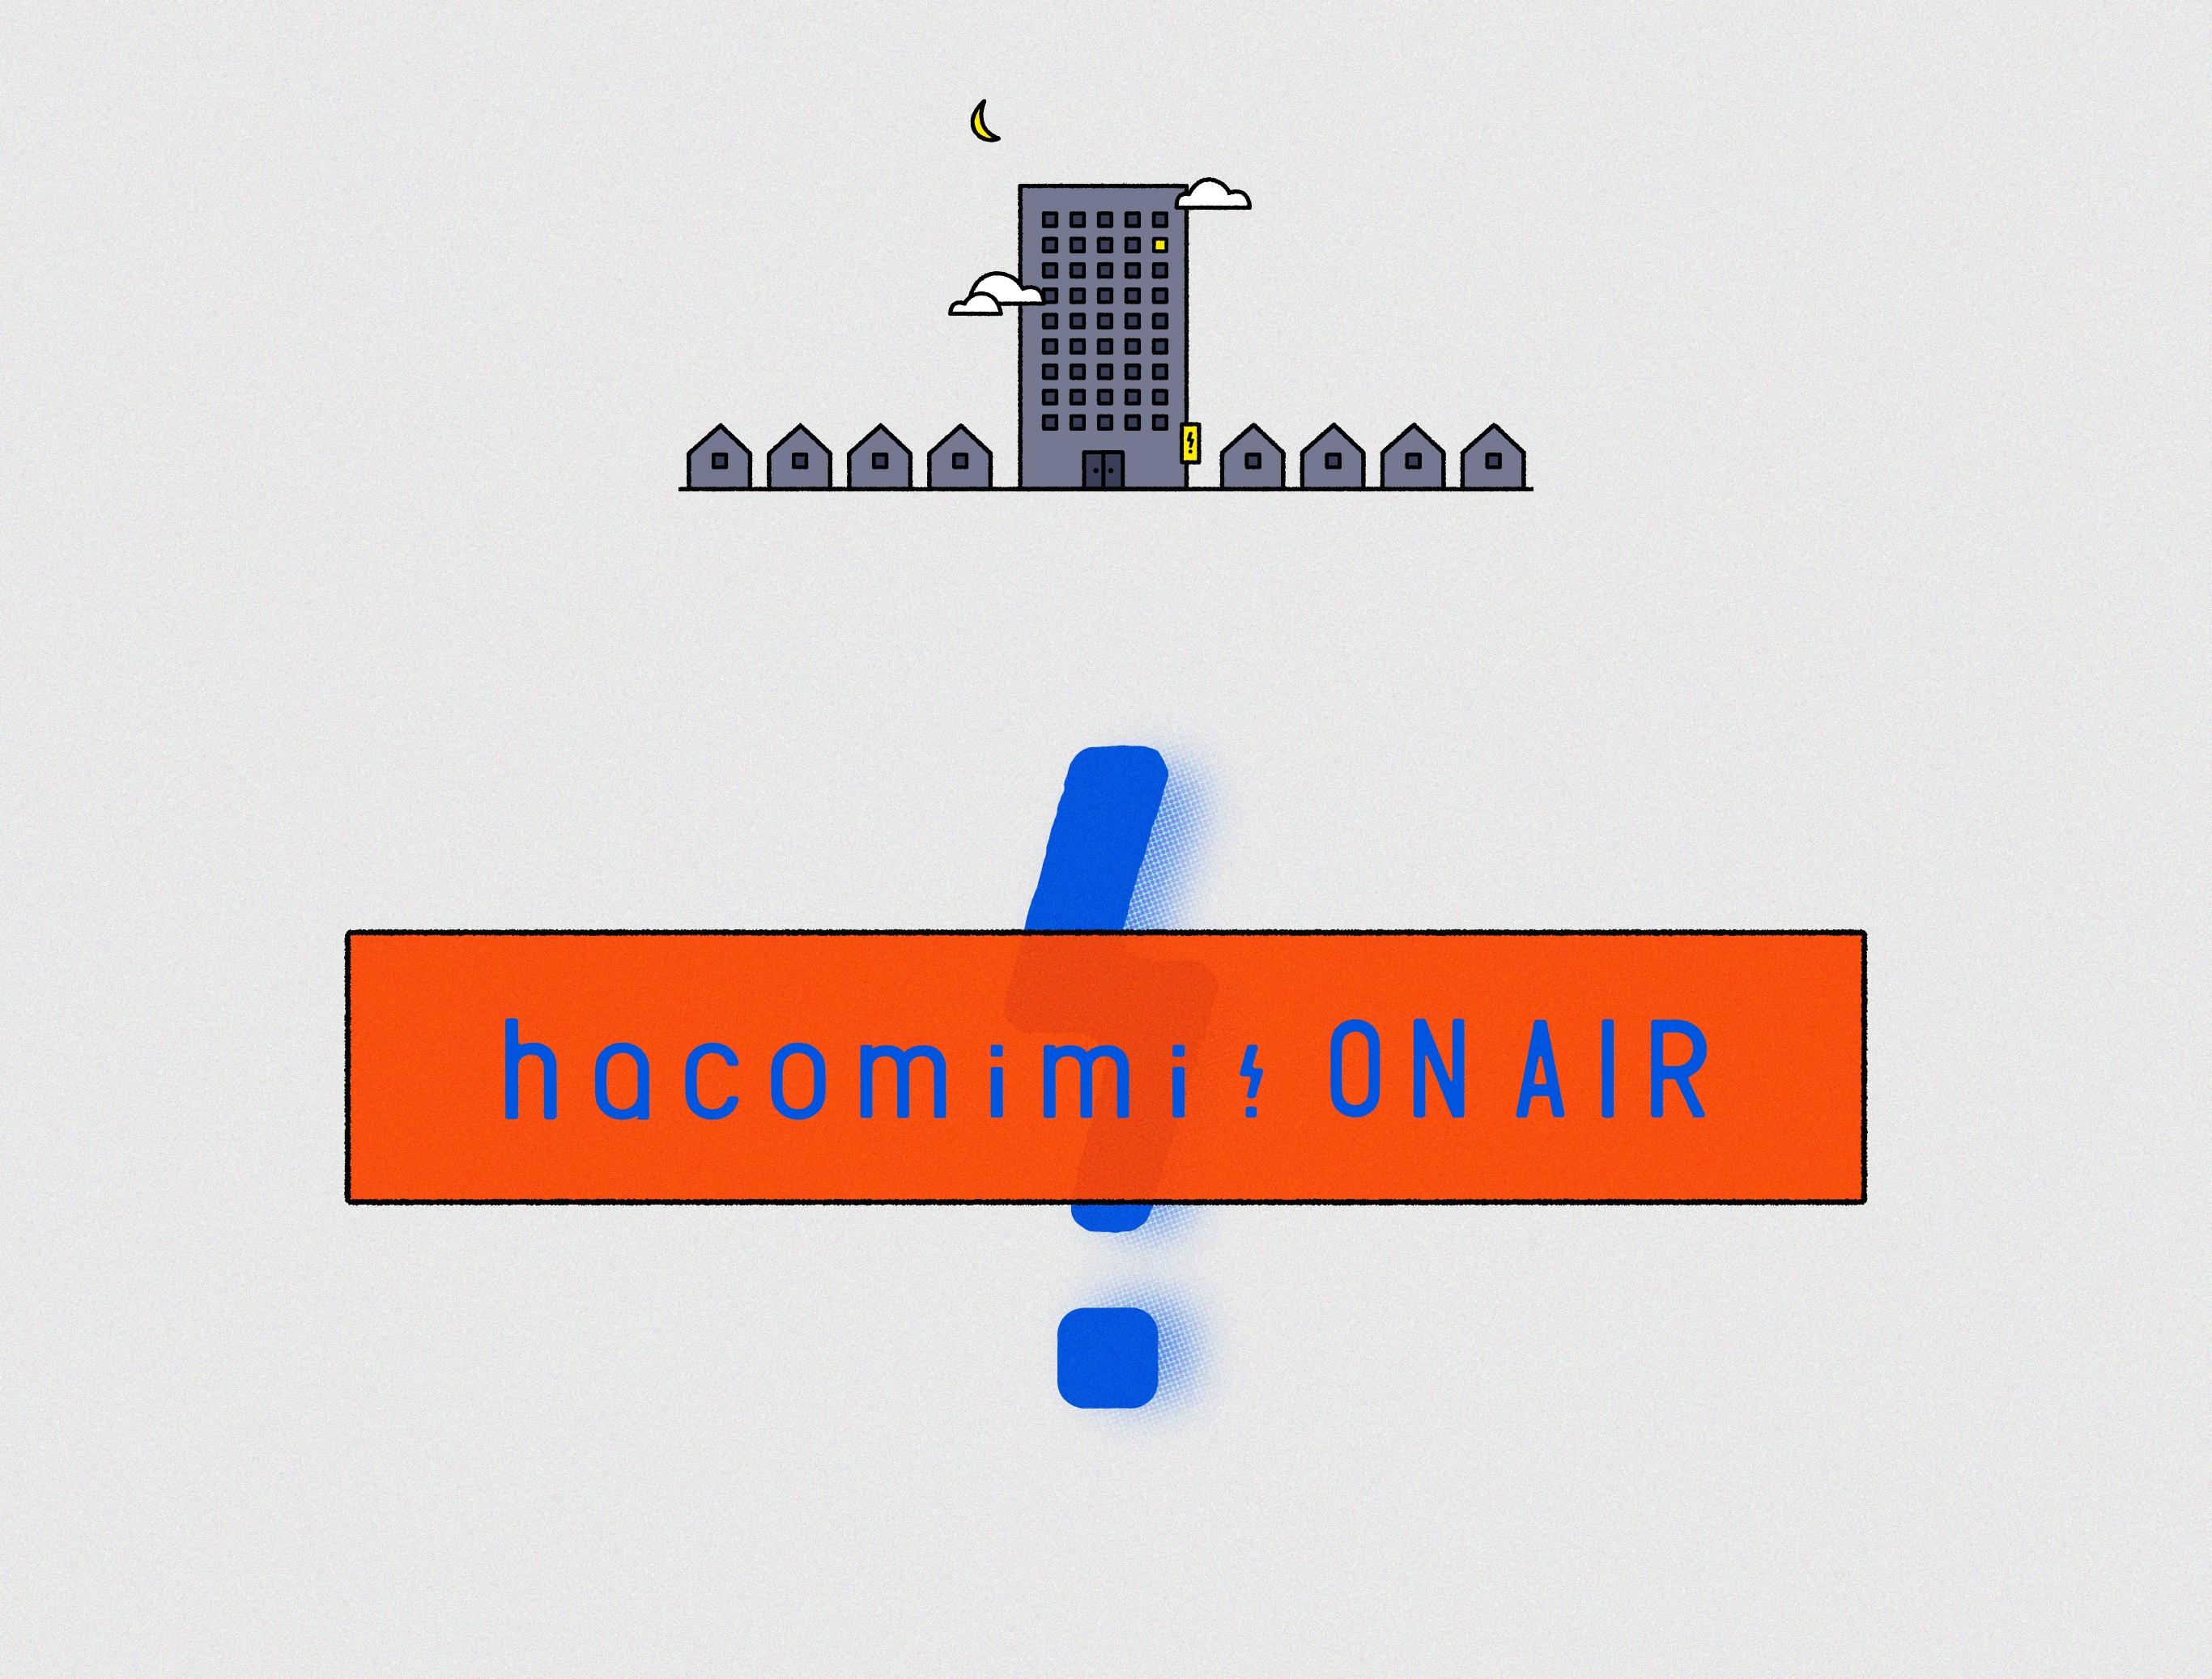 hacomini! ON AIR